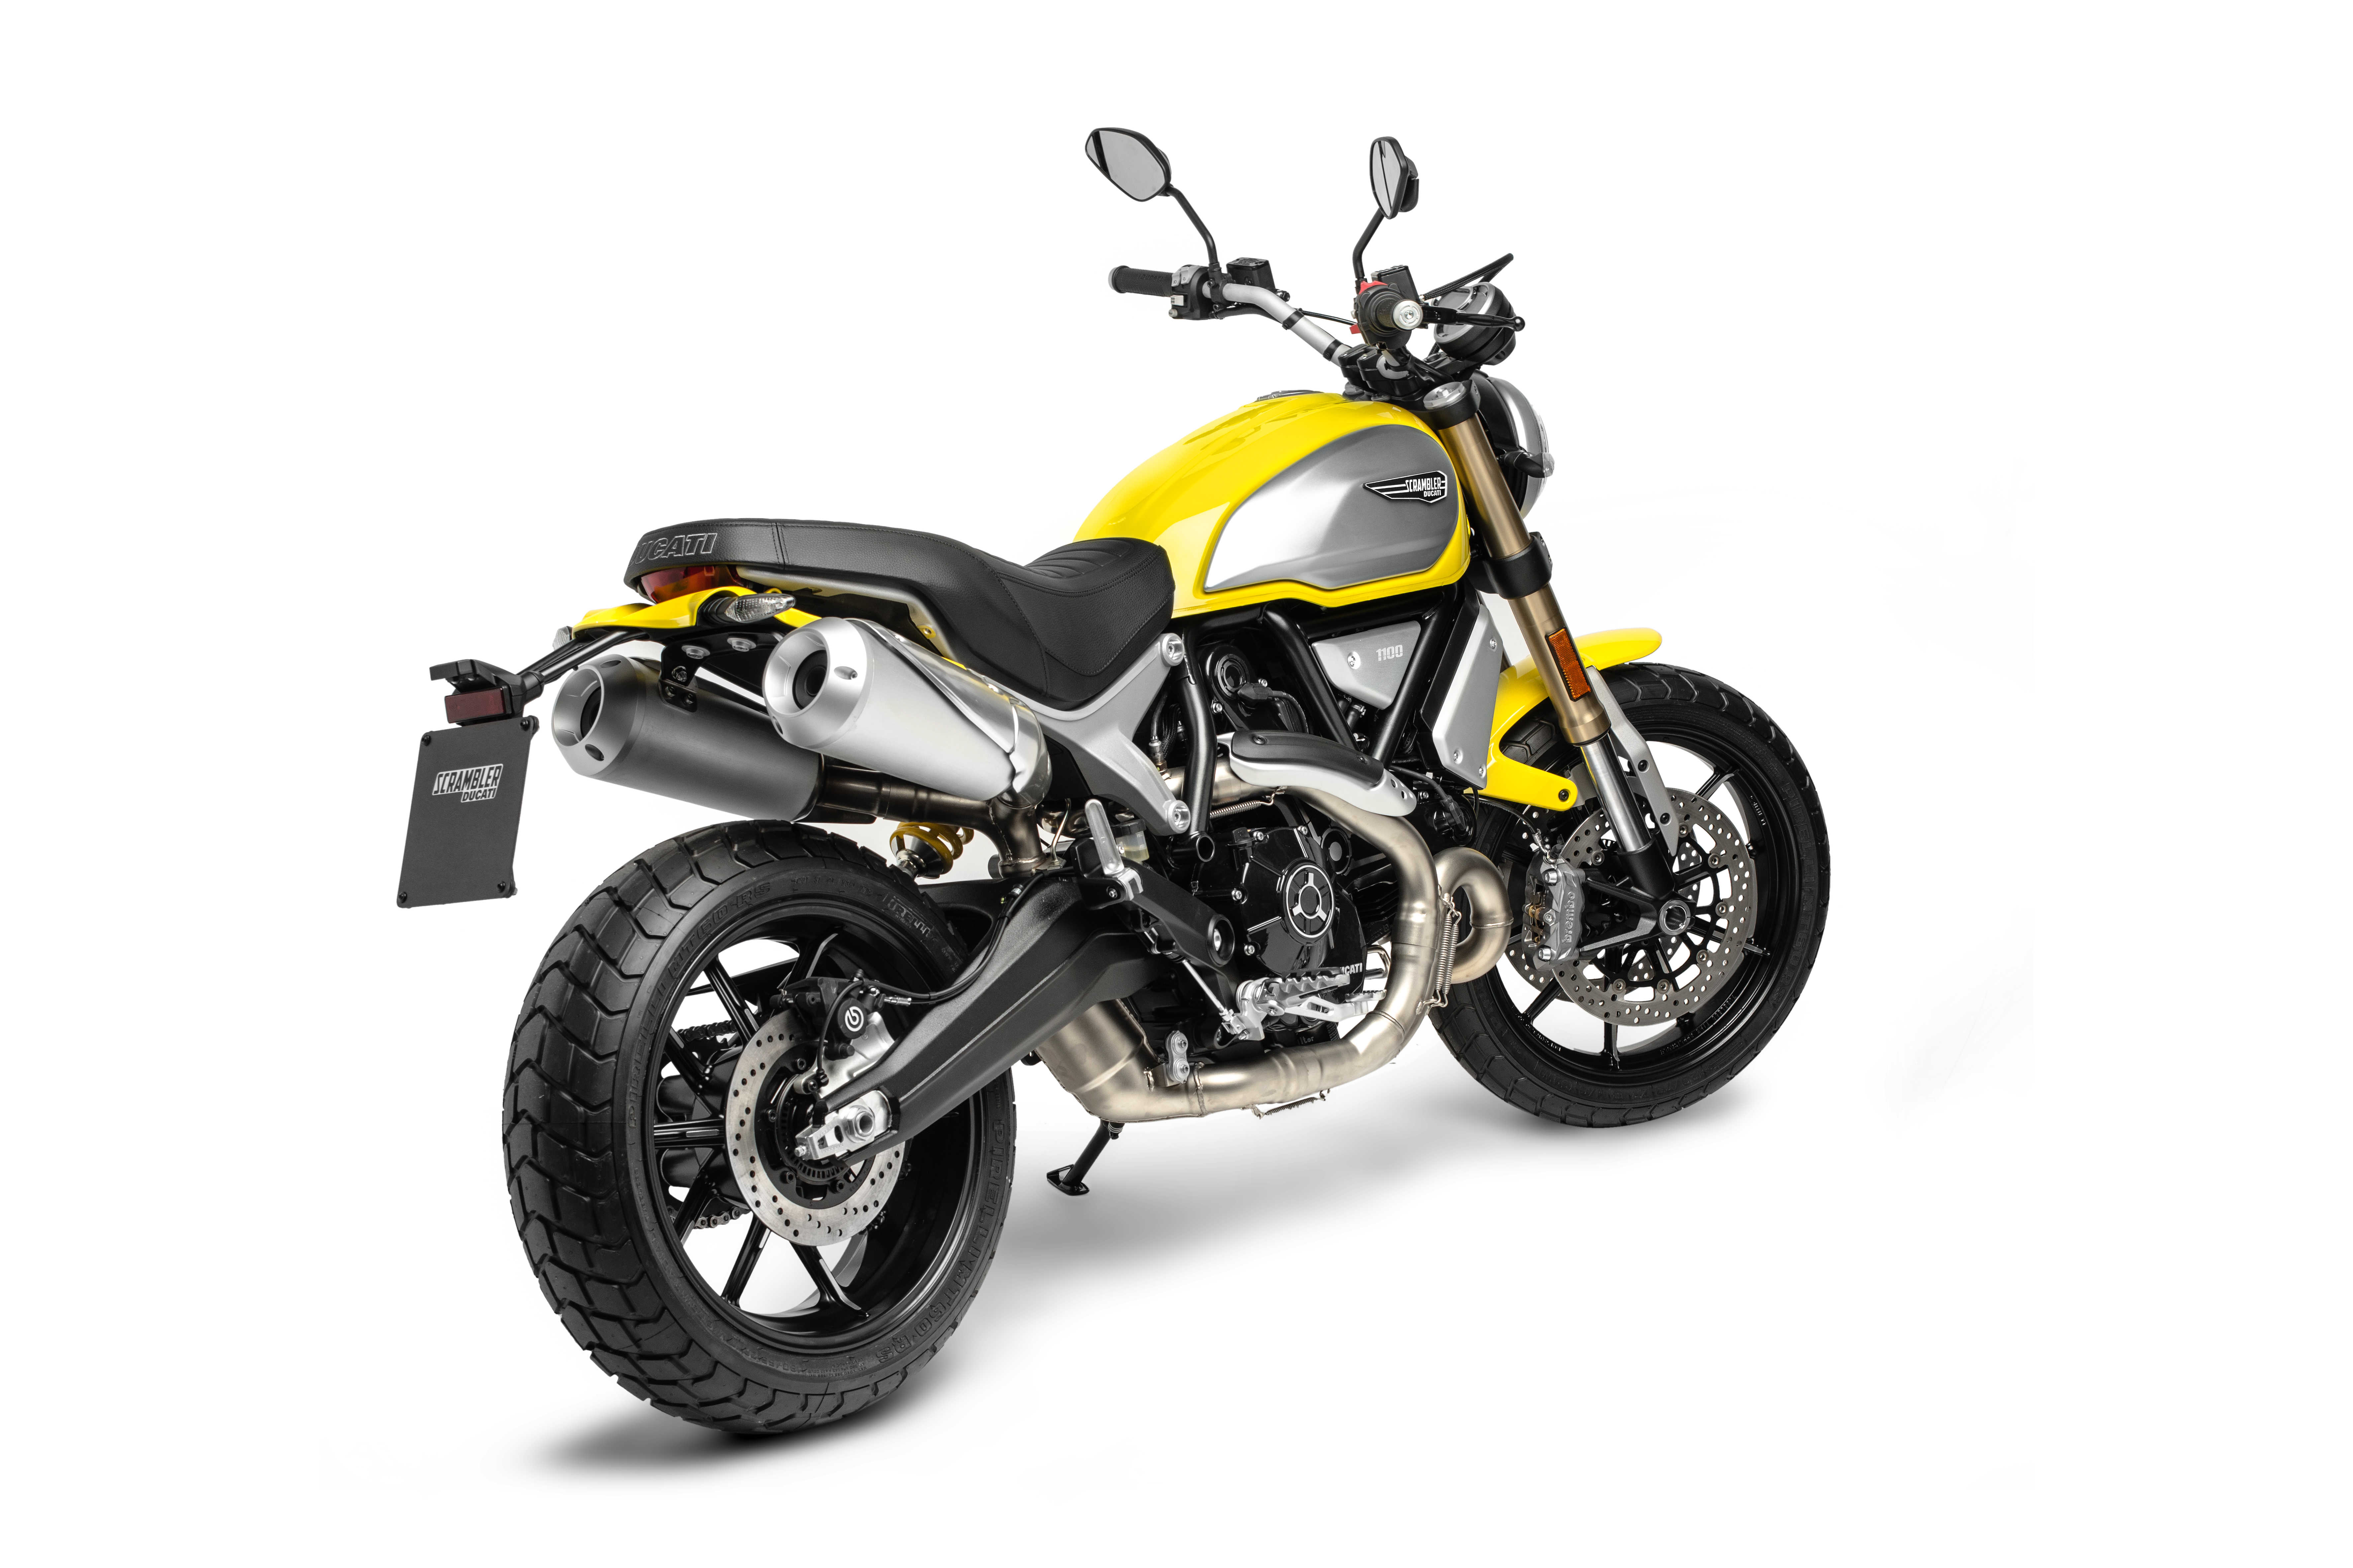 2018 Ducati Scrambler 1100 First Look Revzilla